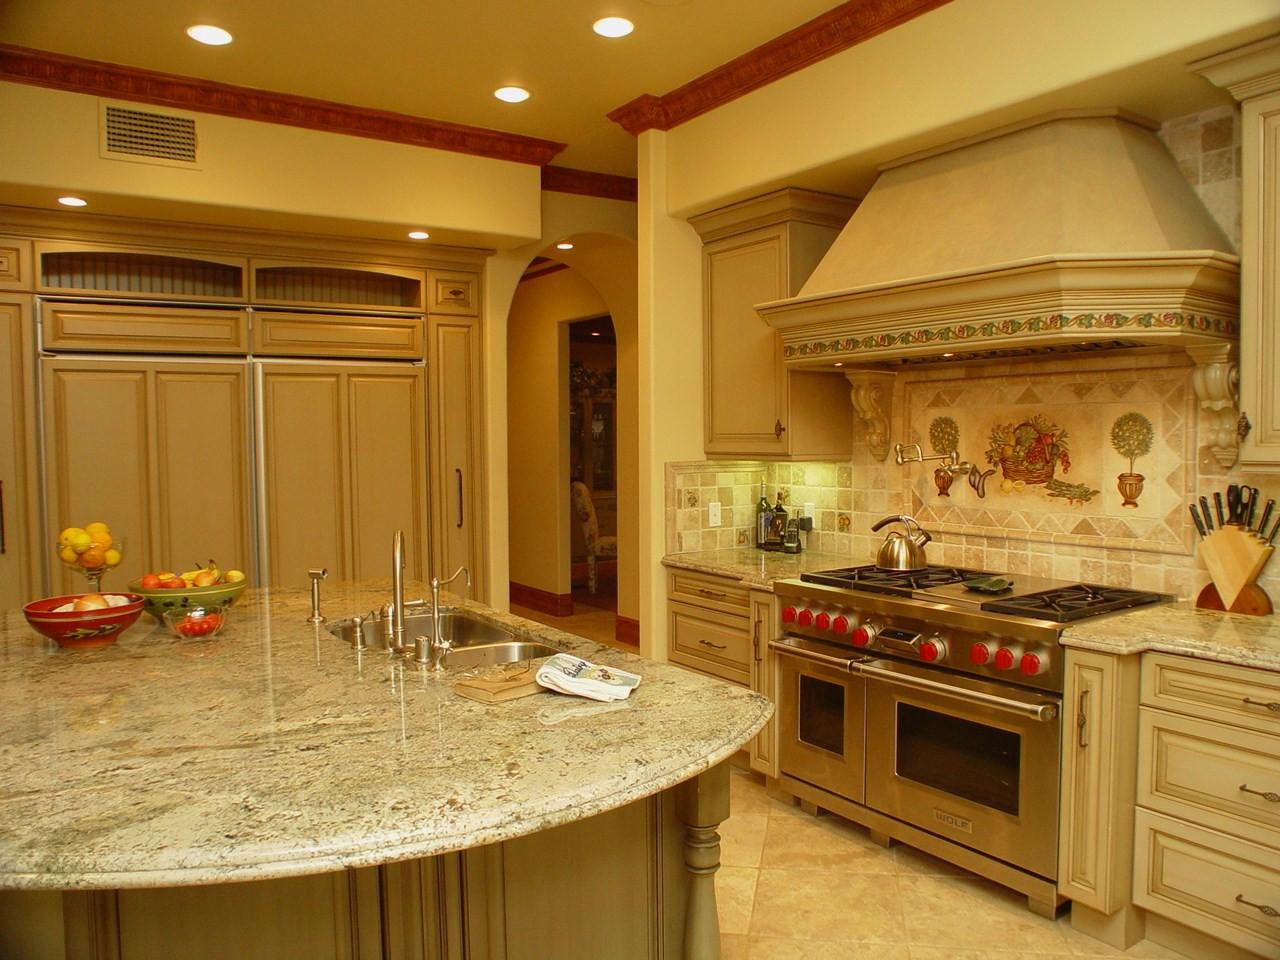 The Jacob Mediterranean Kitchen Remodel